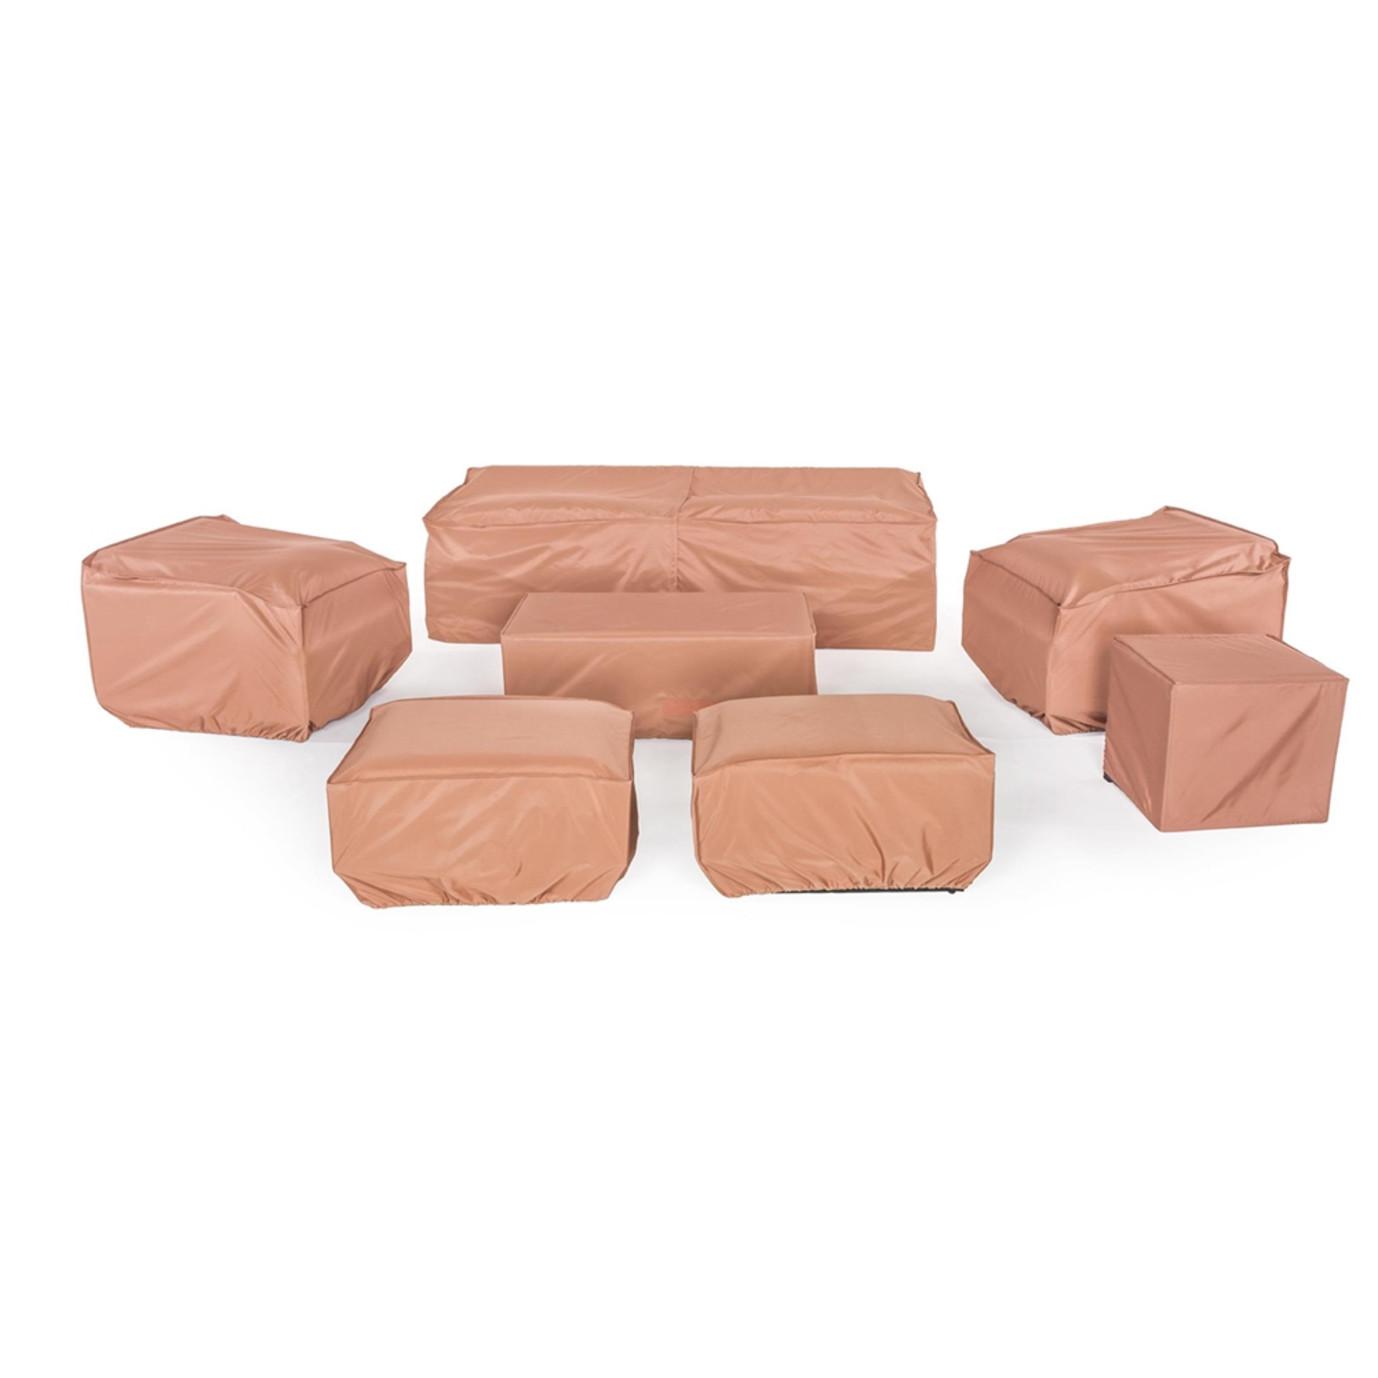 Portofino® Comfort 8pc Motion Club Seating Furniture Cover Set